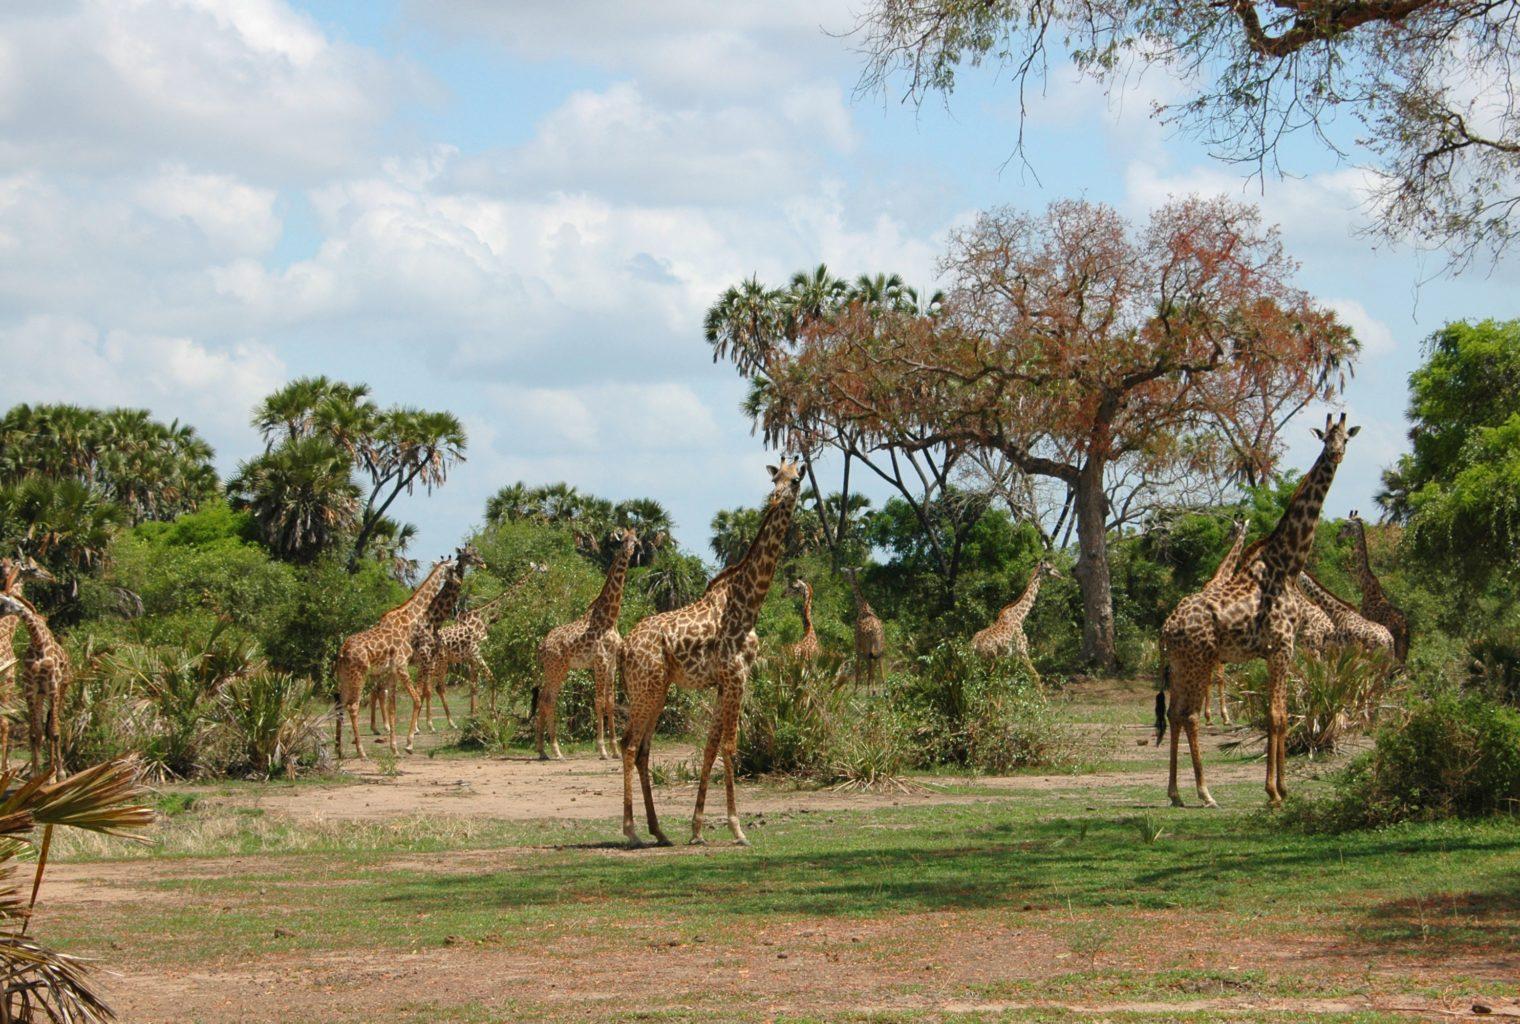 Beho Beho Tanzania Giraffe